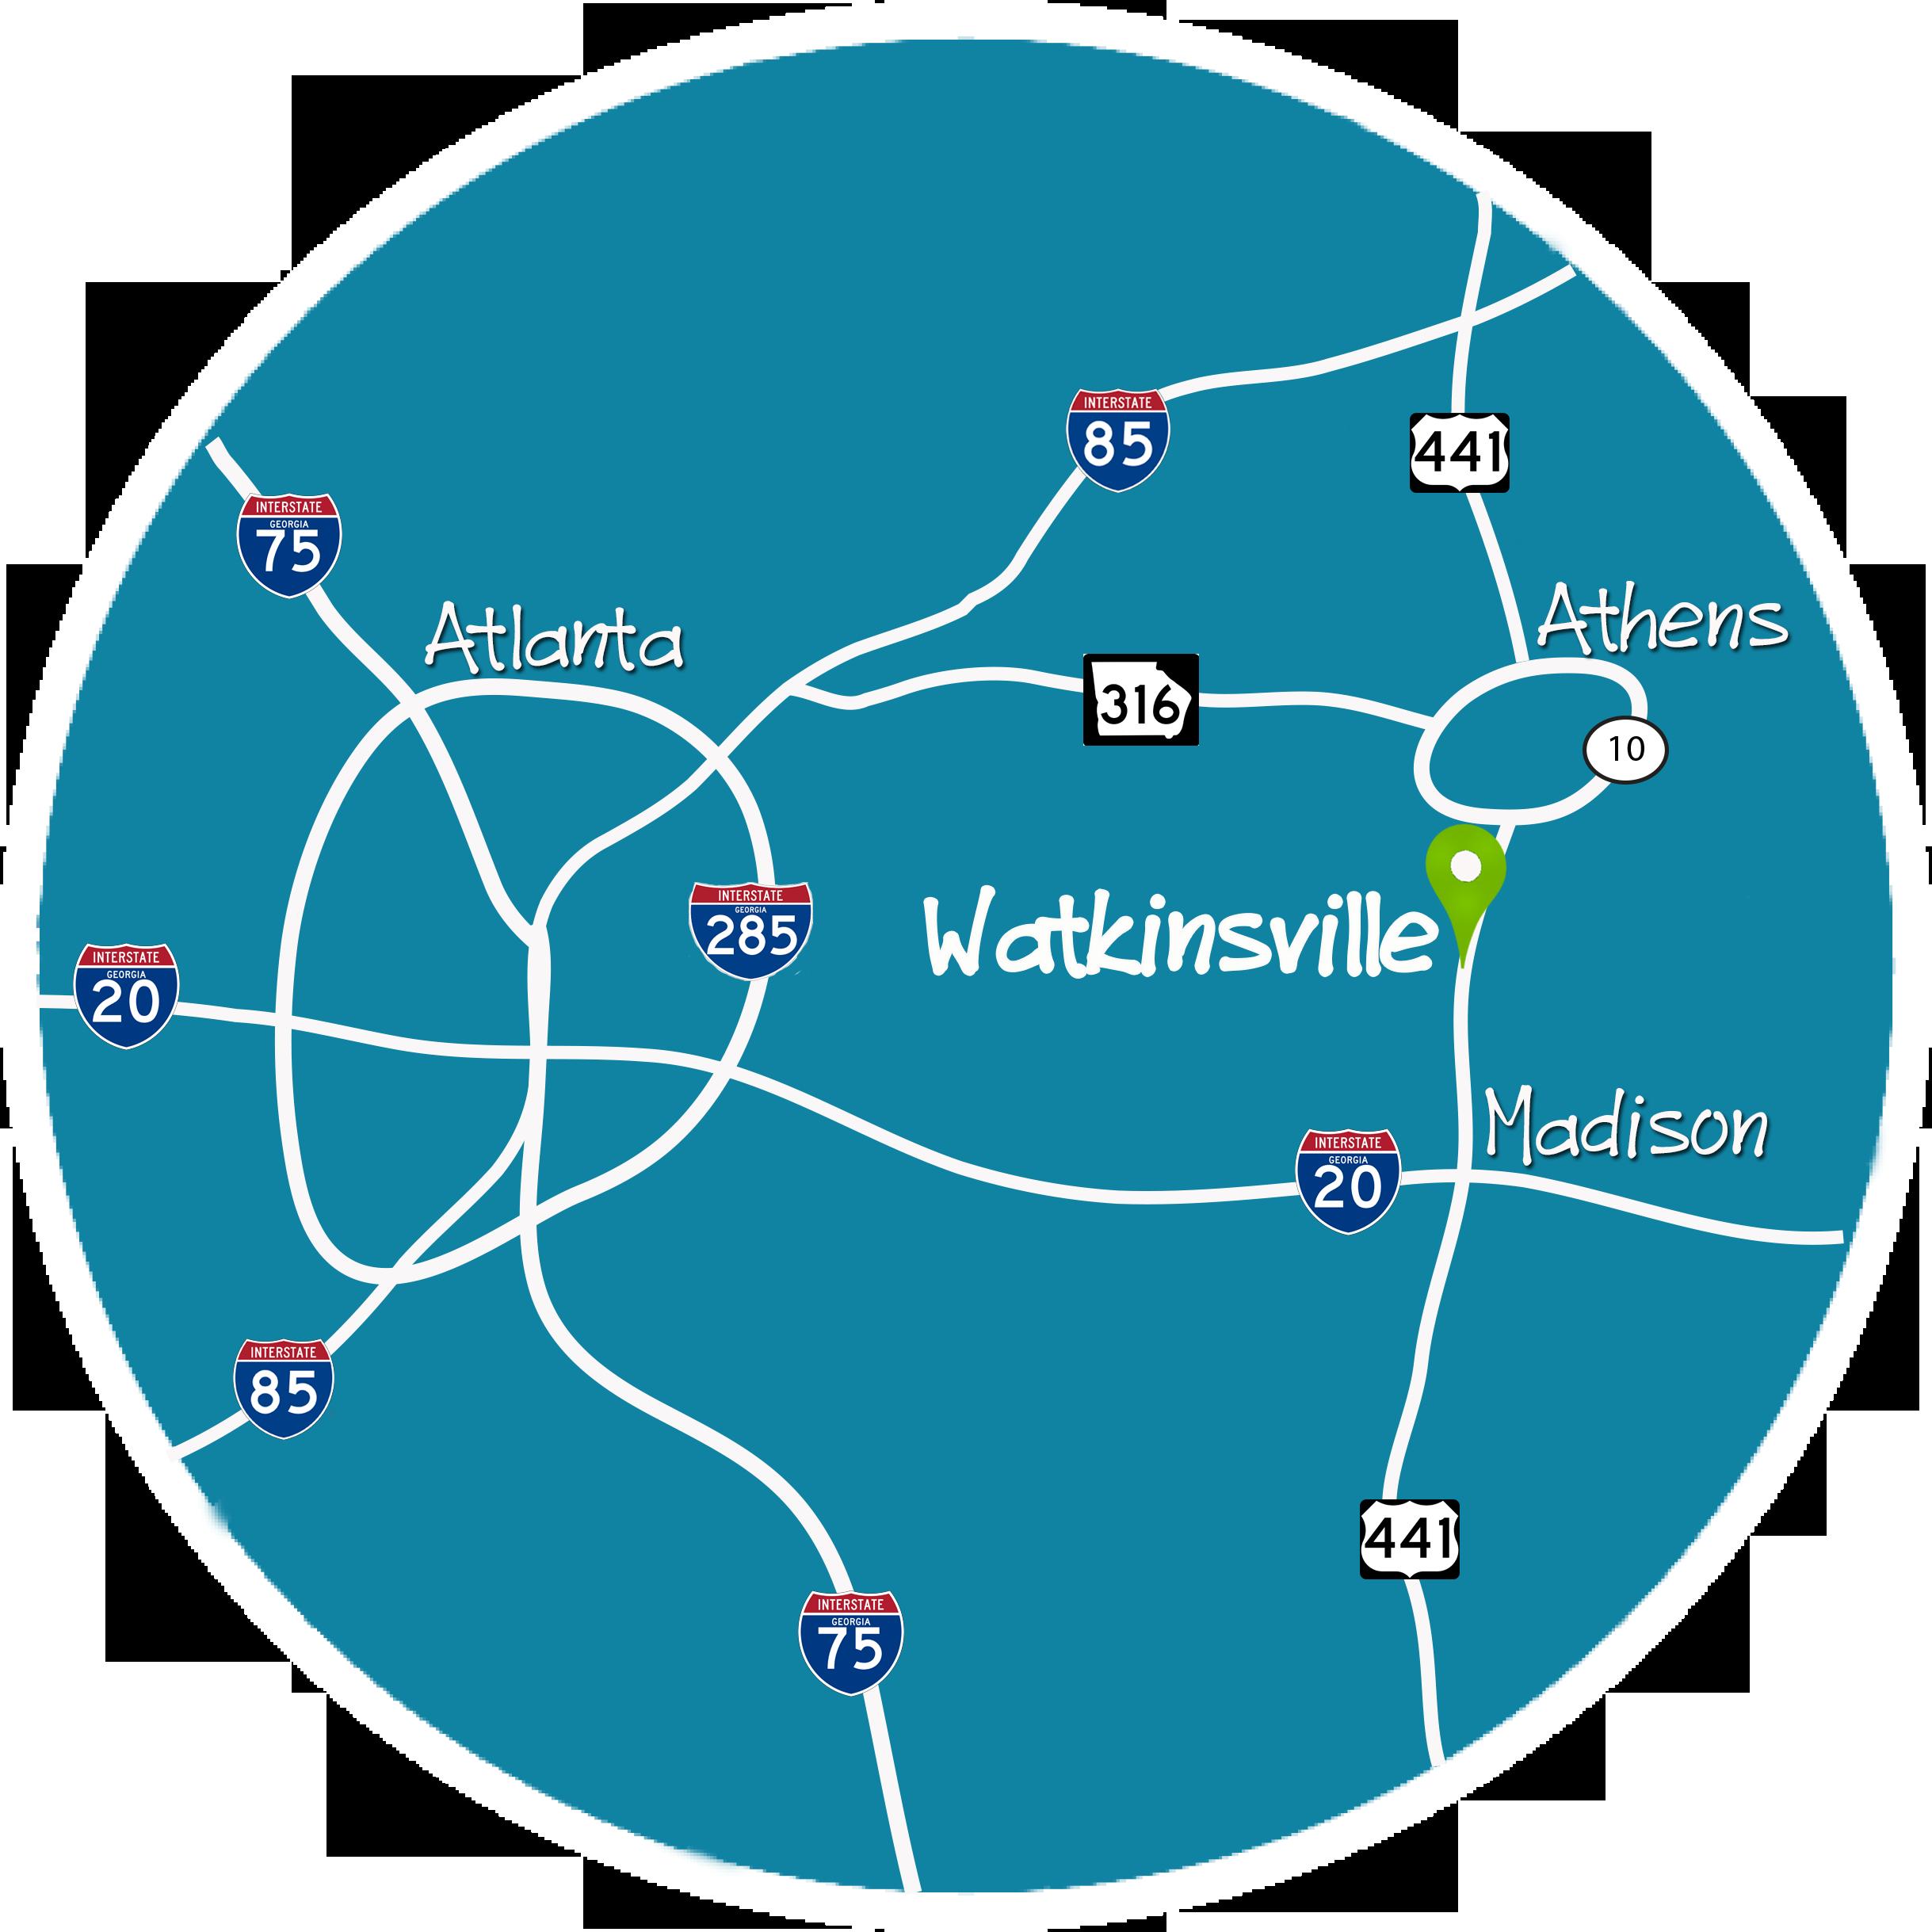 Map Of Georgia 7 Wonders.Visit Watkinsville Oconee County Georgia Official Tourism Website